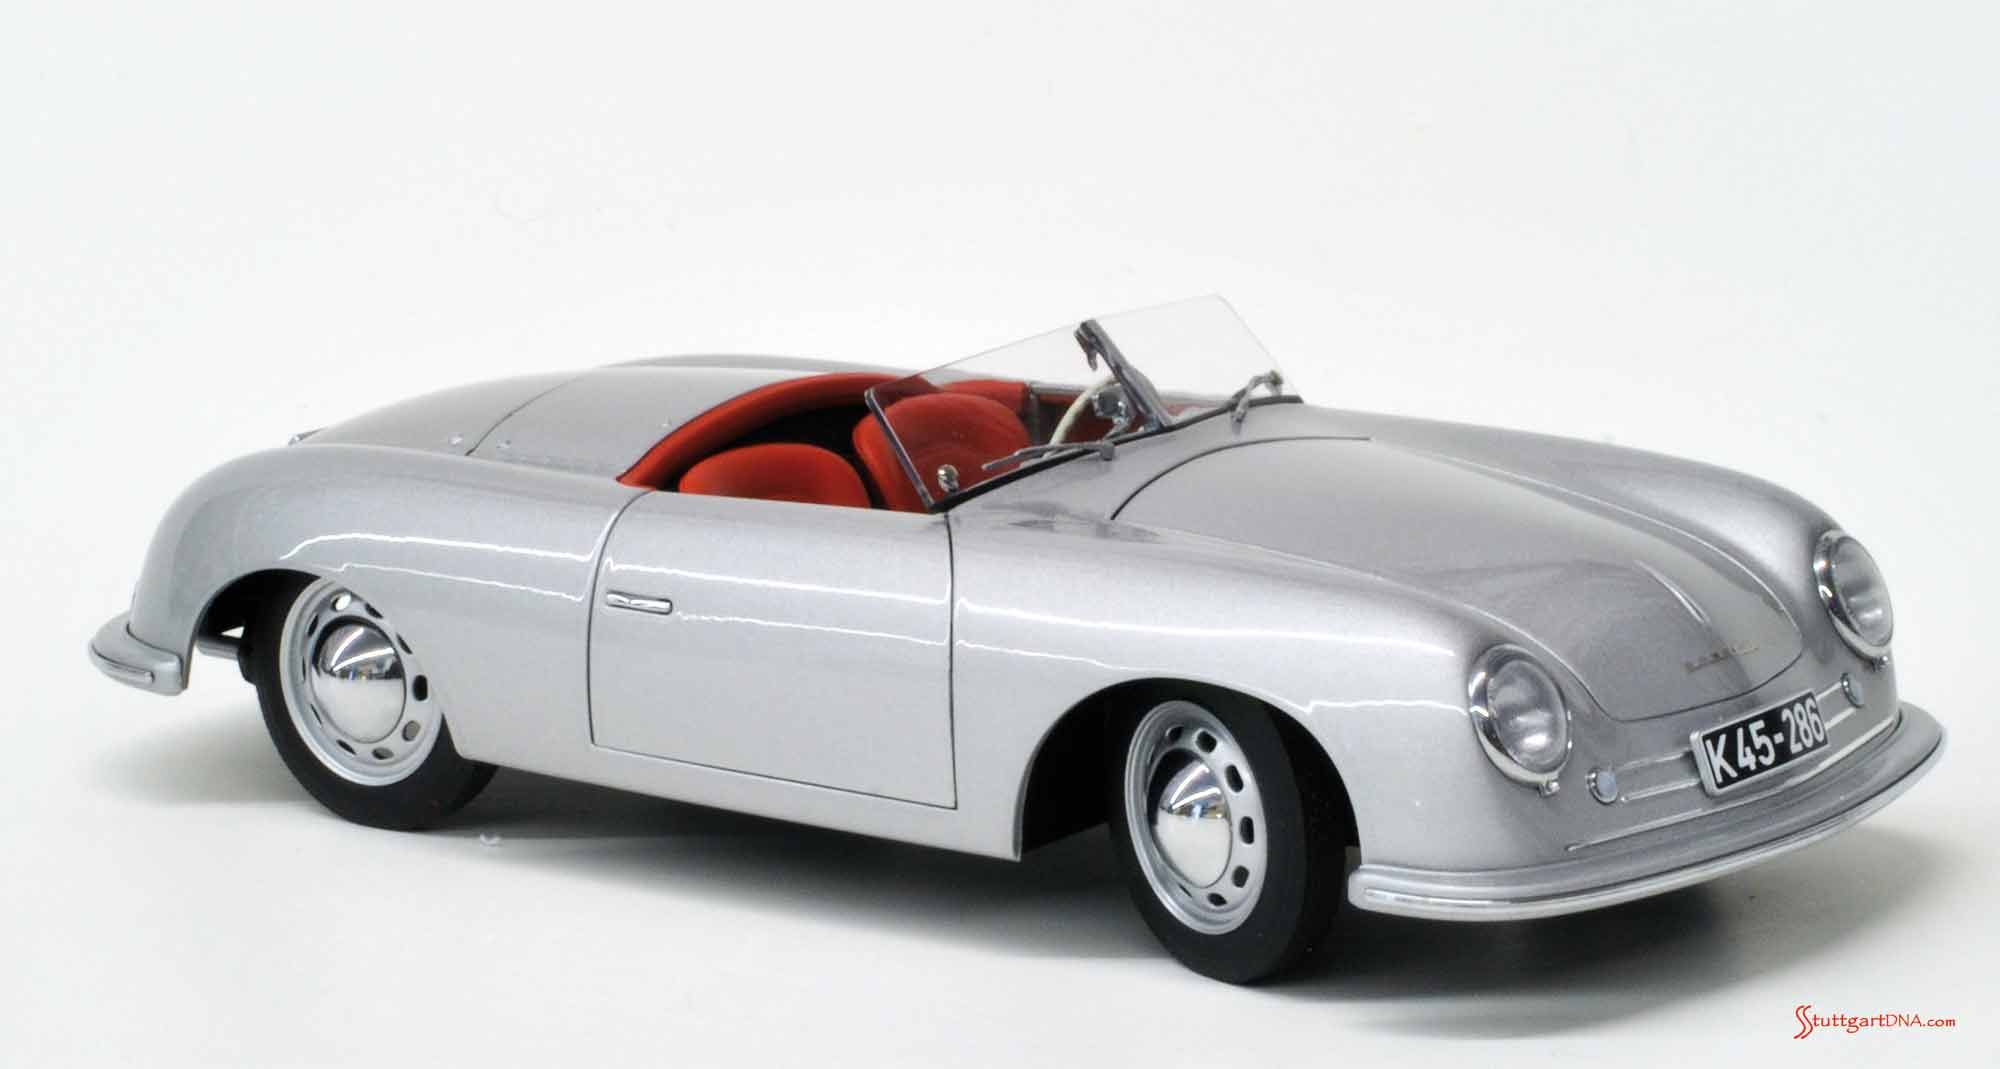 Porsche no 1 stuttgartdna porsche no 1 model from porsche museum stuttgart credit porsche ag vanachro Choice Image